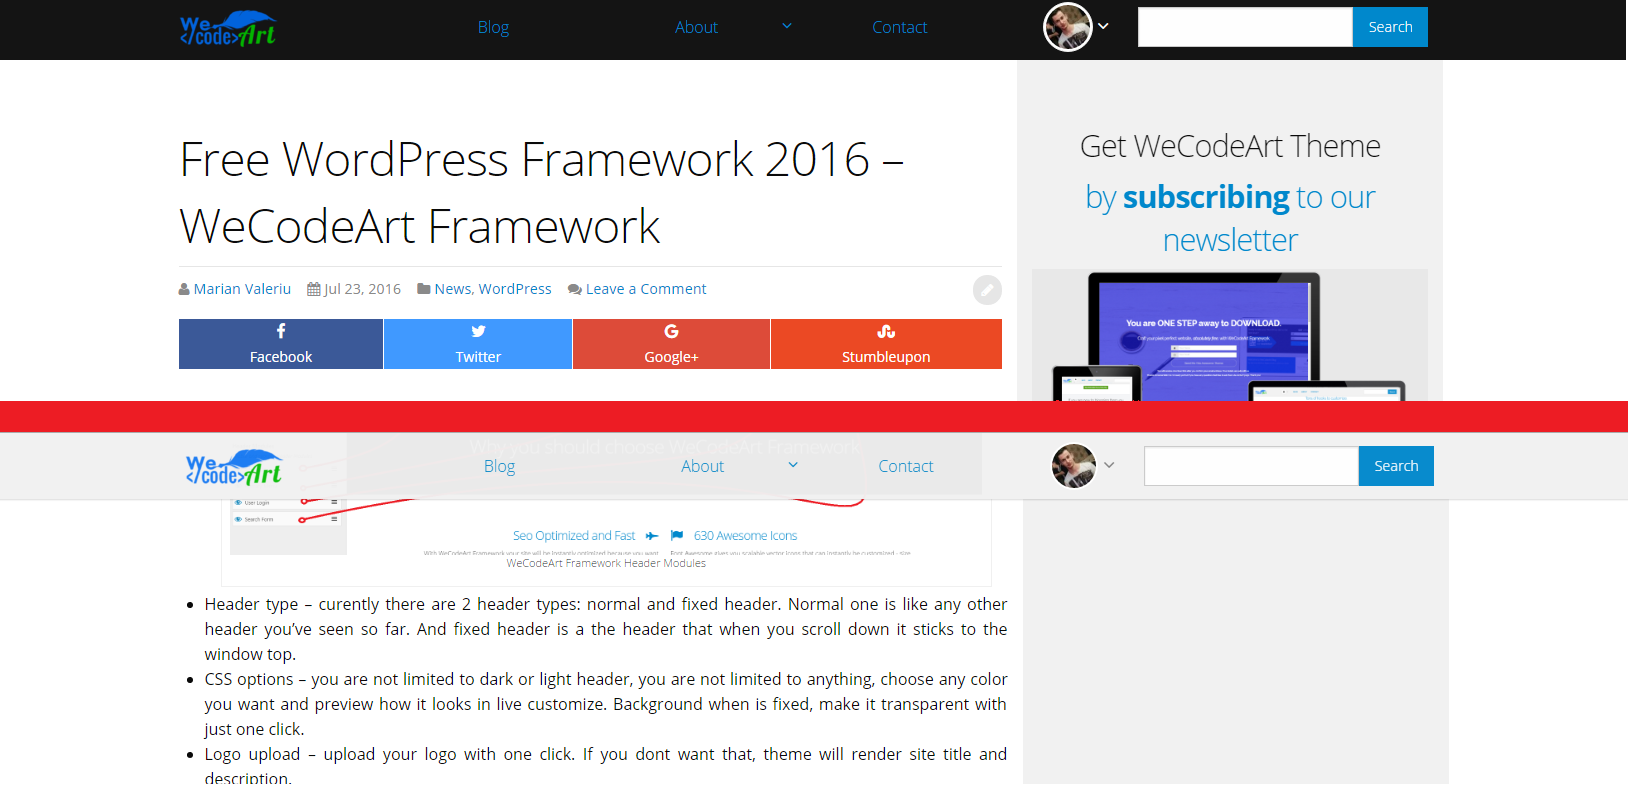 WeCodeArt Framework Header Types